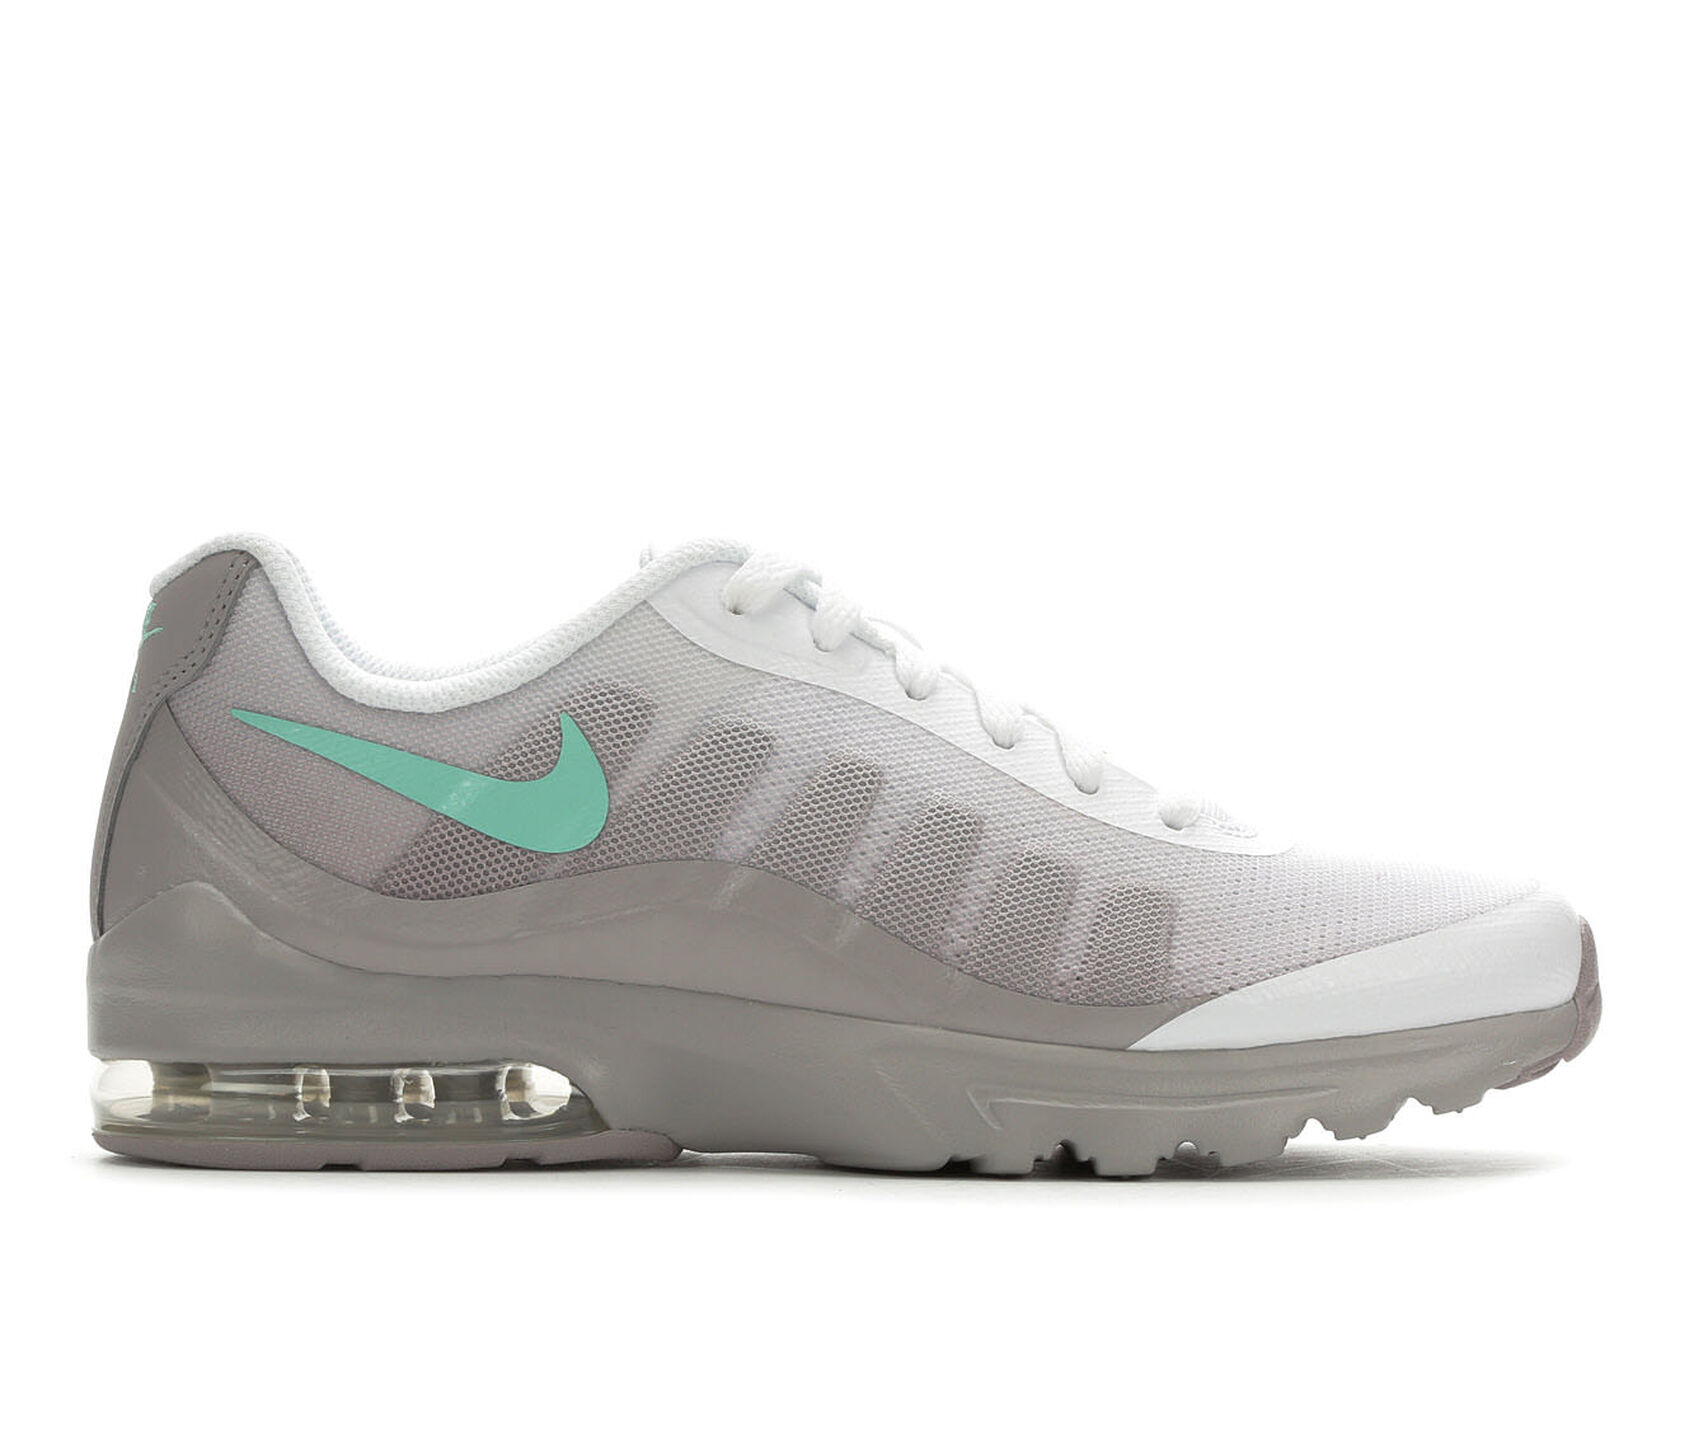 ... Nike Air Max Invigor Print Athletic Sneakers. Carousel Controls 8303a54d59